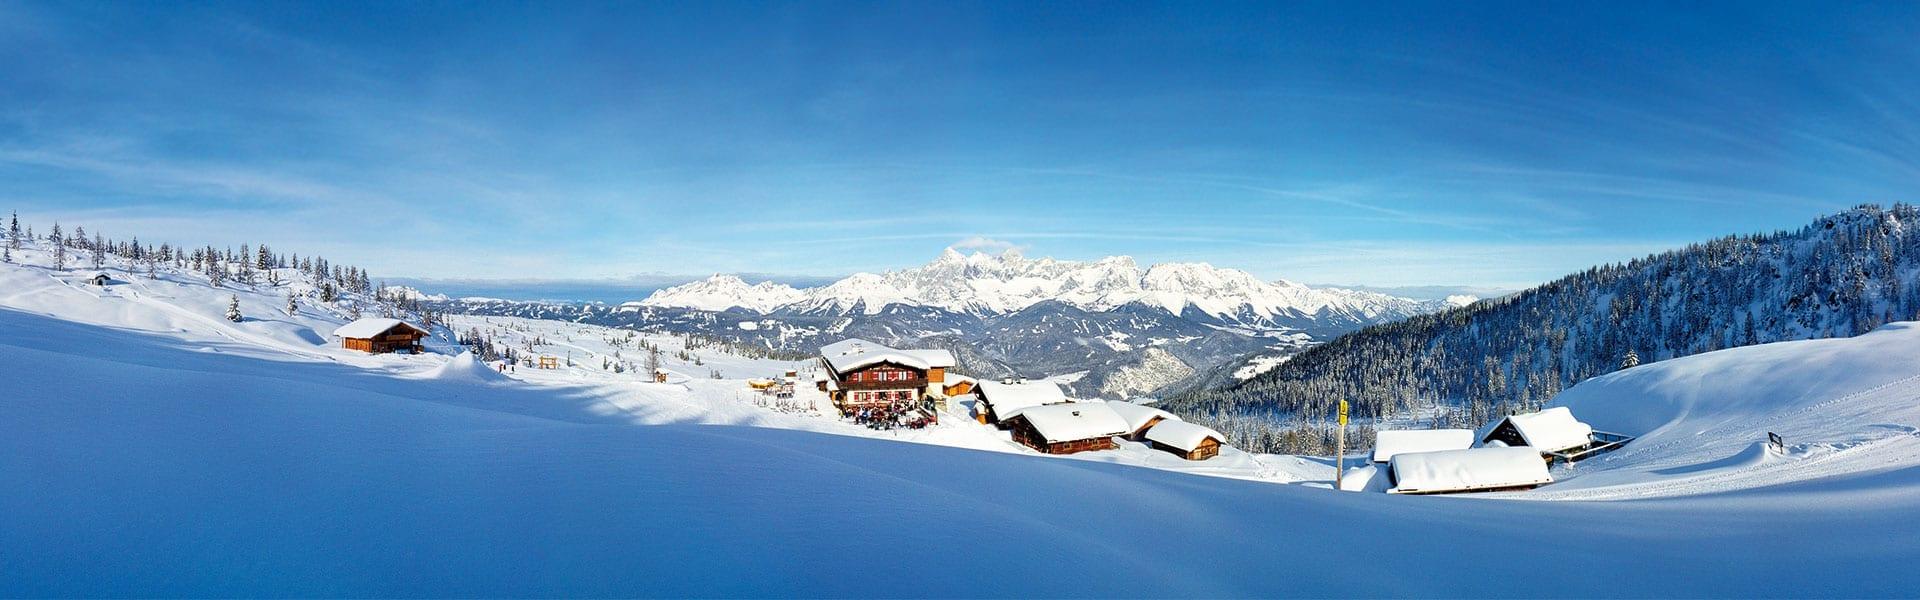 Skihütte in Ski amade, Fageralm